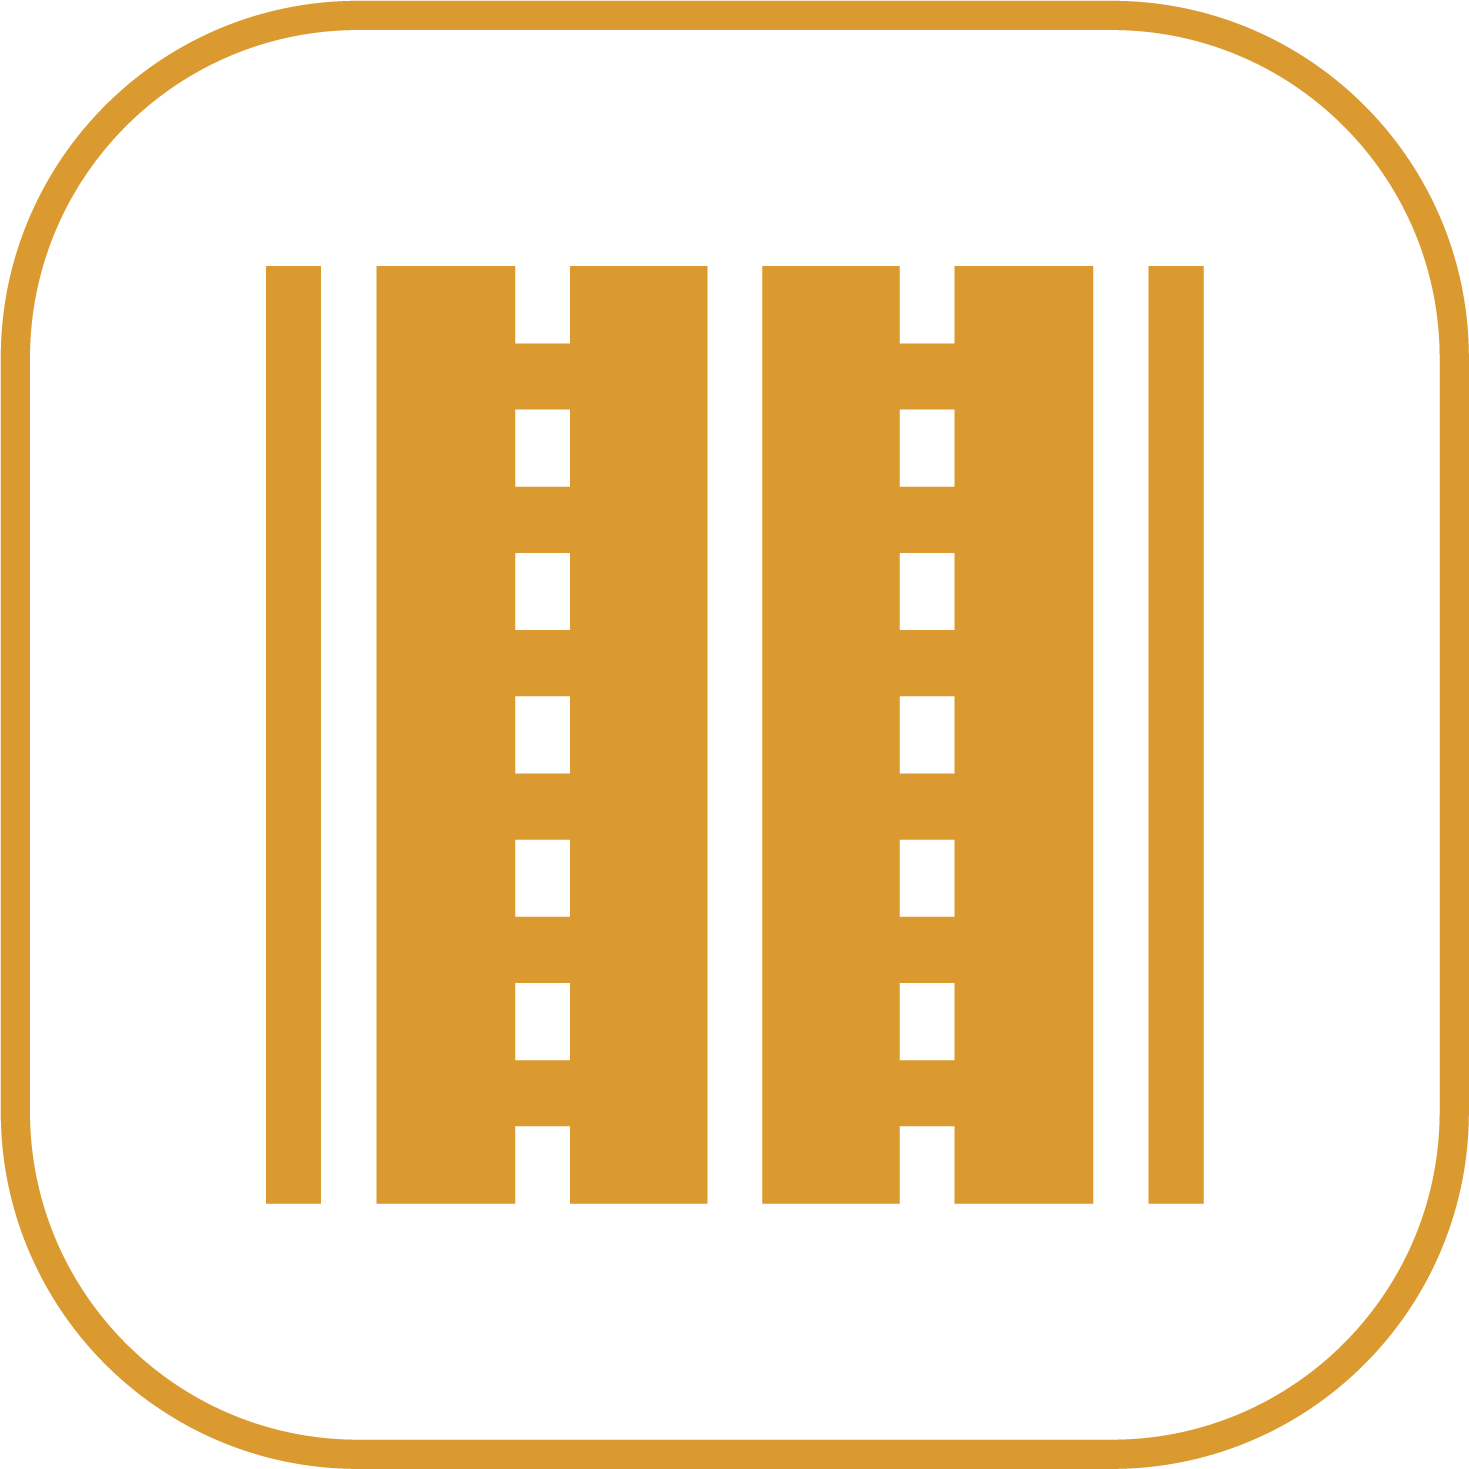 Pesona Remboelan Serpong - Rumah 2 Lantai Cukup DP 34 Juta Langsung Akad 11